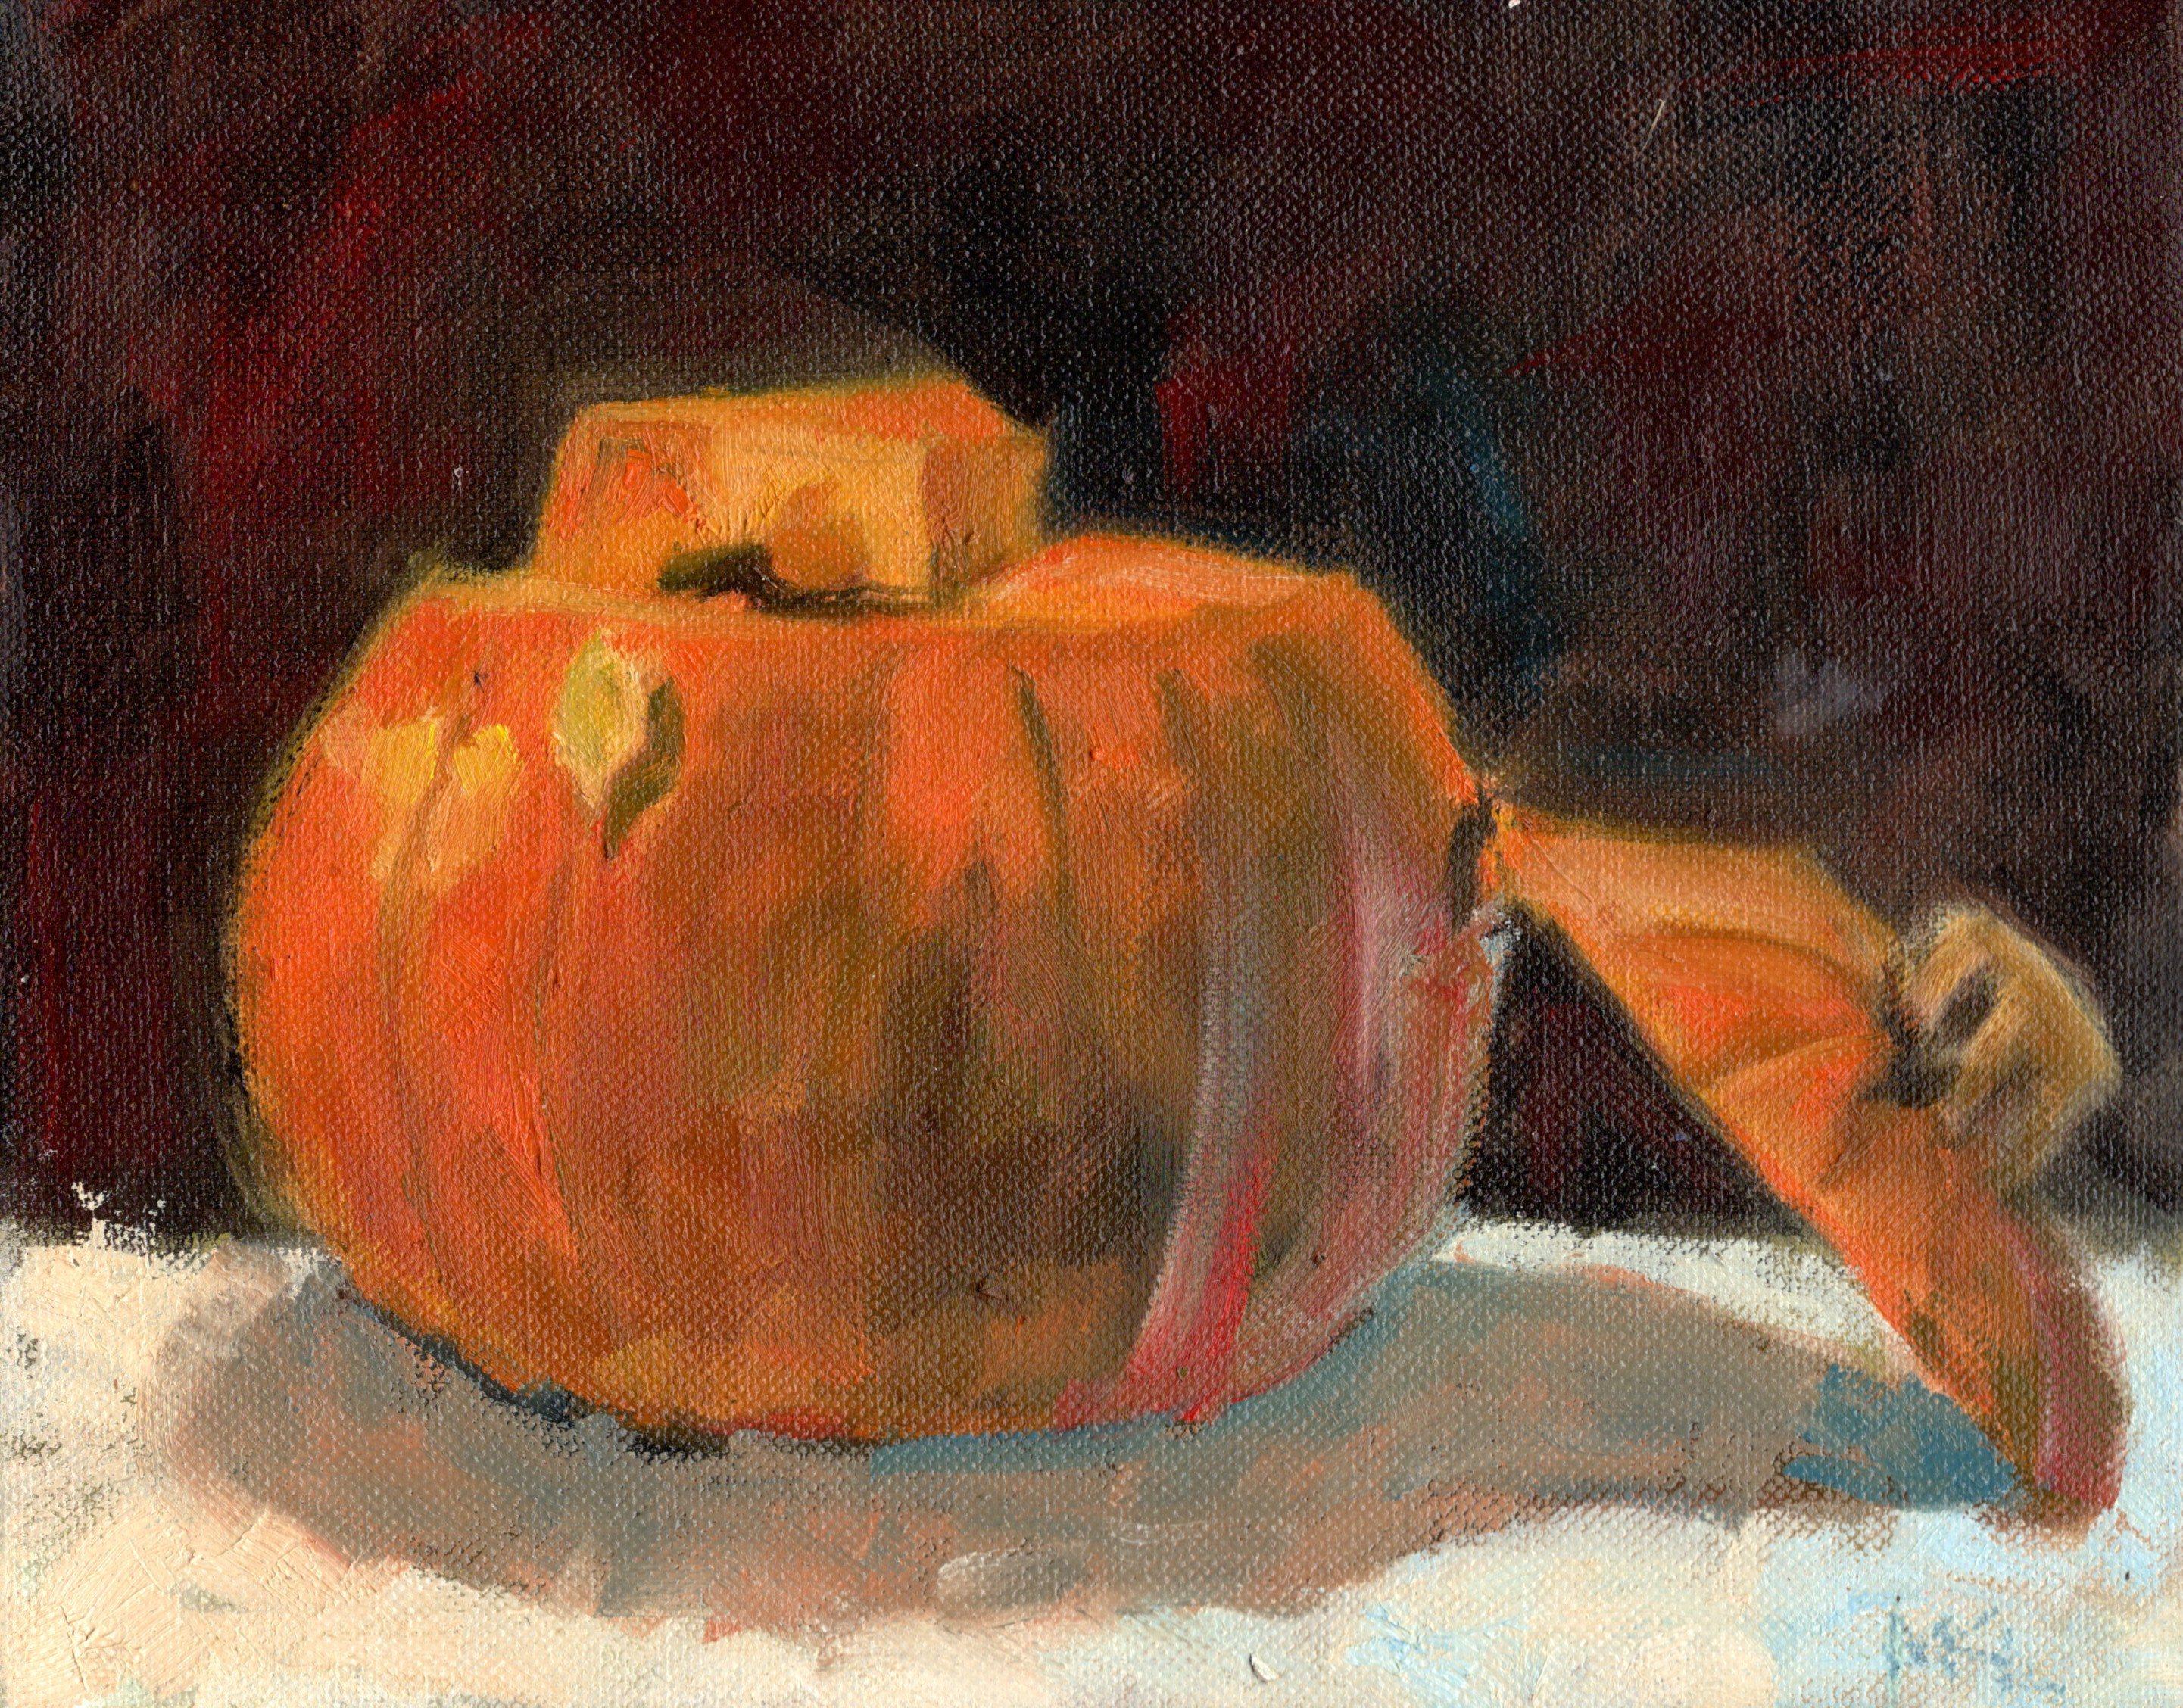 Pumpkin with Top Off